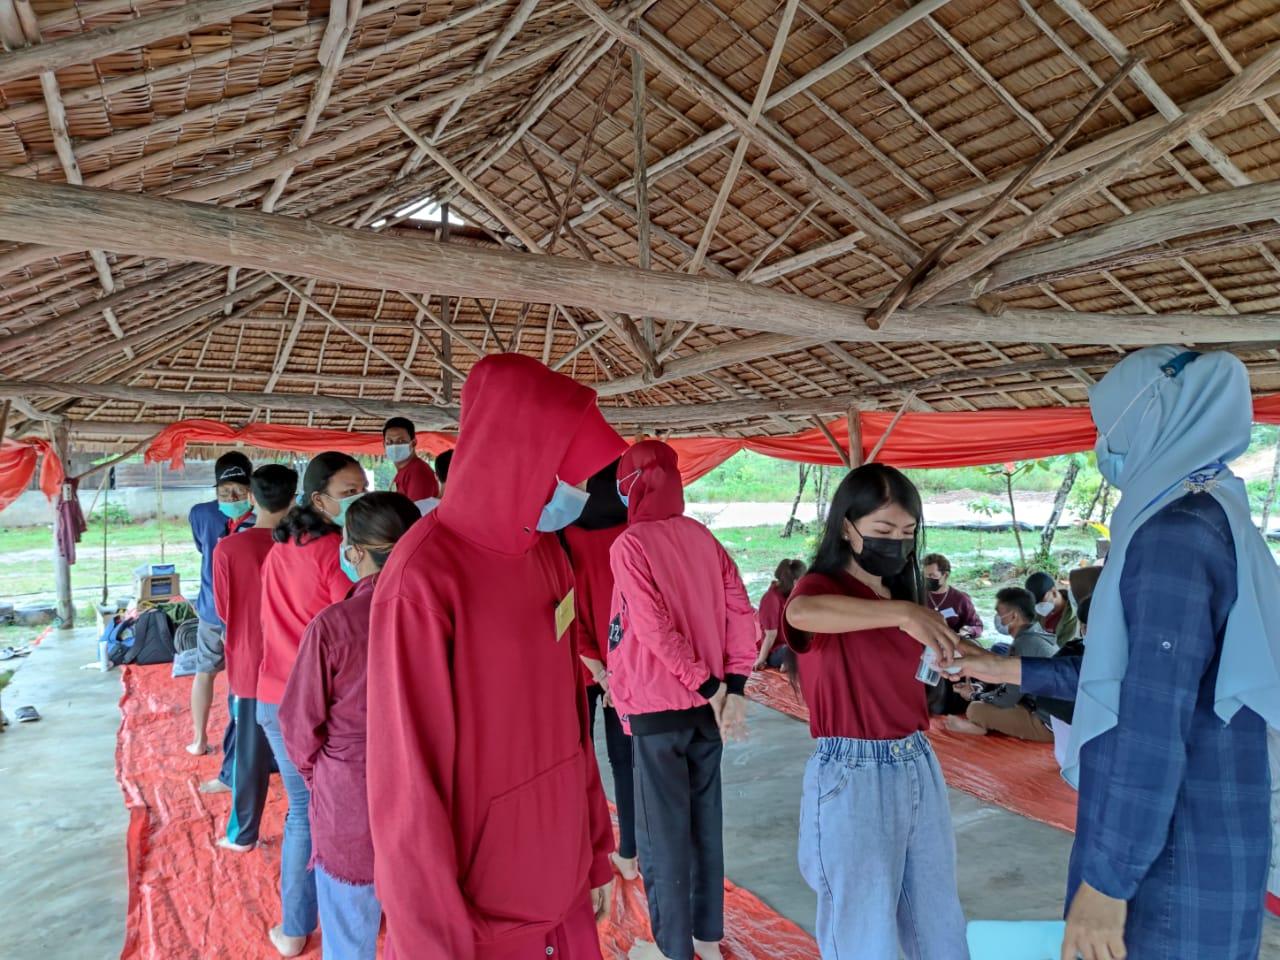 Kursus bahasa inggris batam (3)